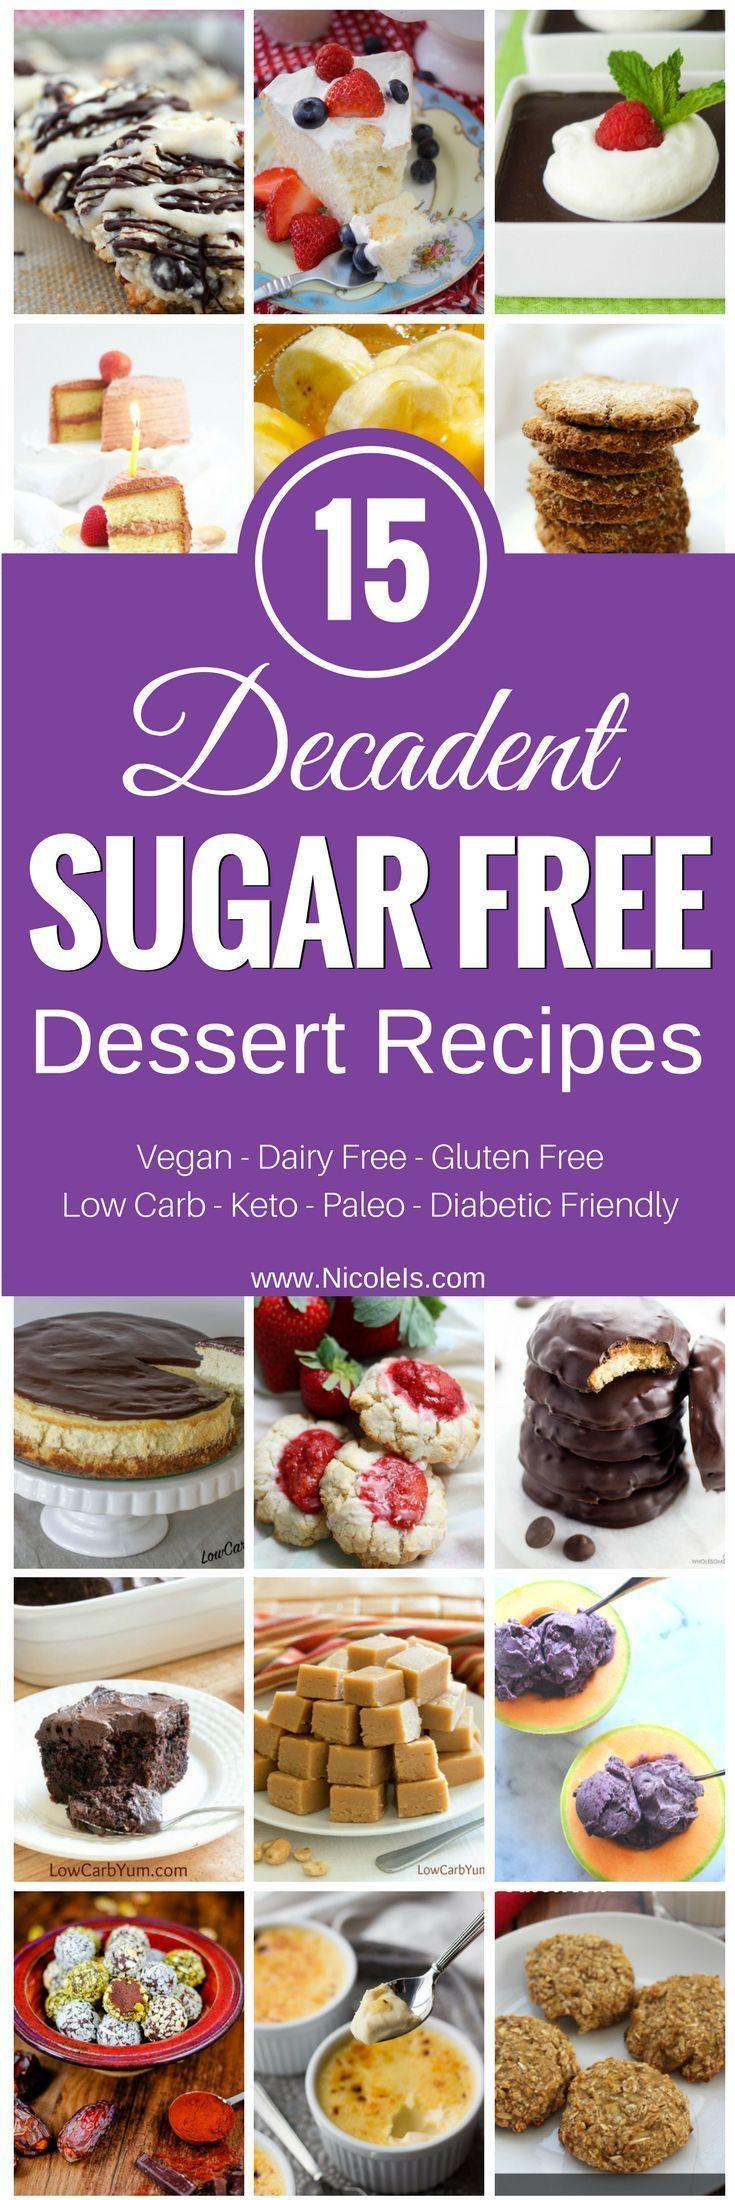 Sugar Free Dessert Recipes For Diabetics  Best 25 Sugar free diabetic recipes ideas on Pinterest